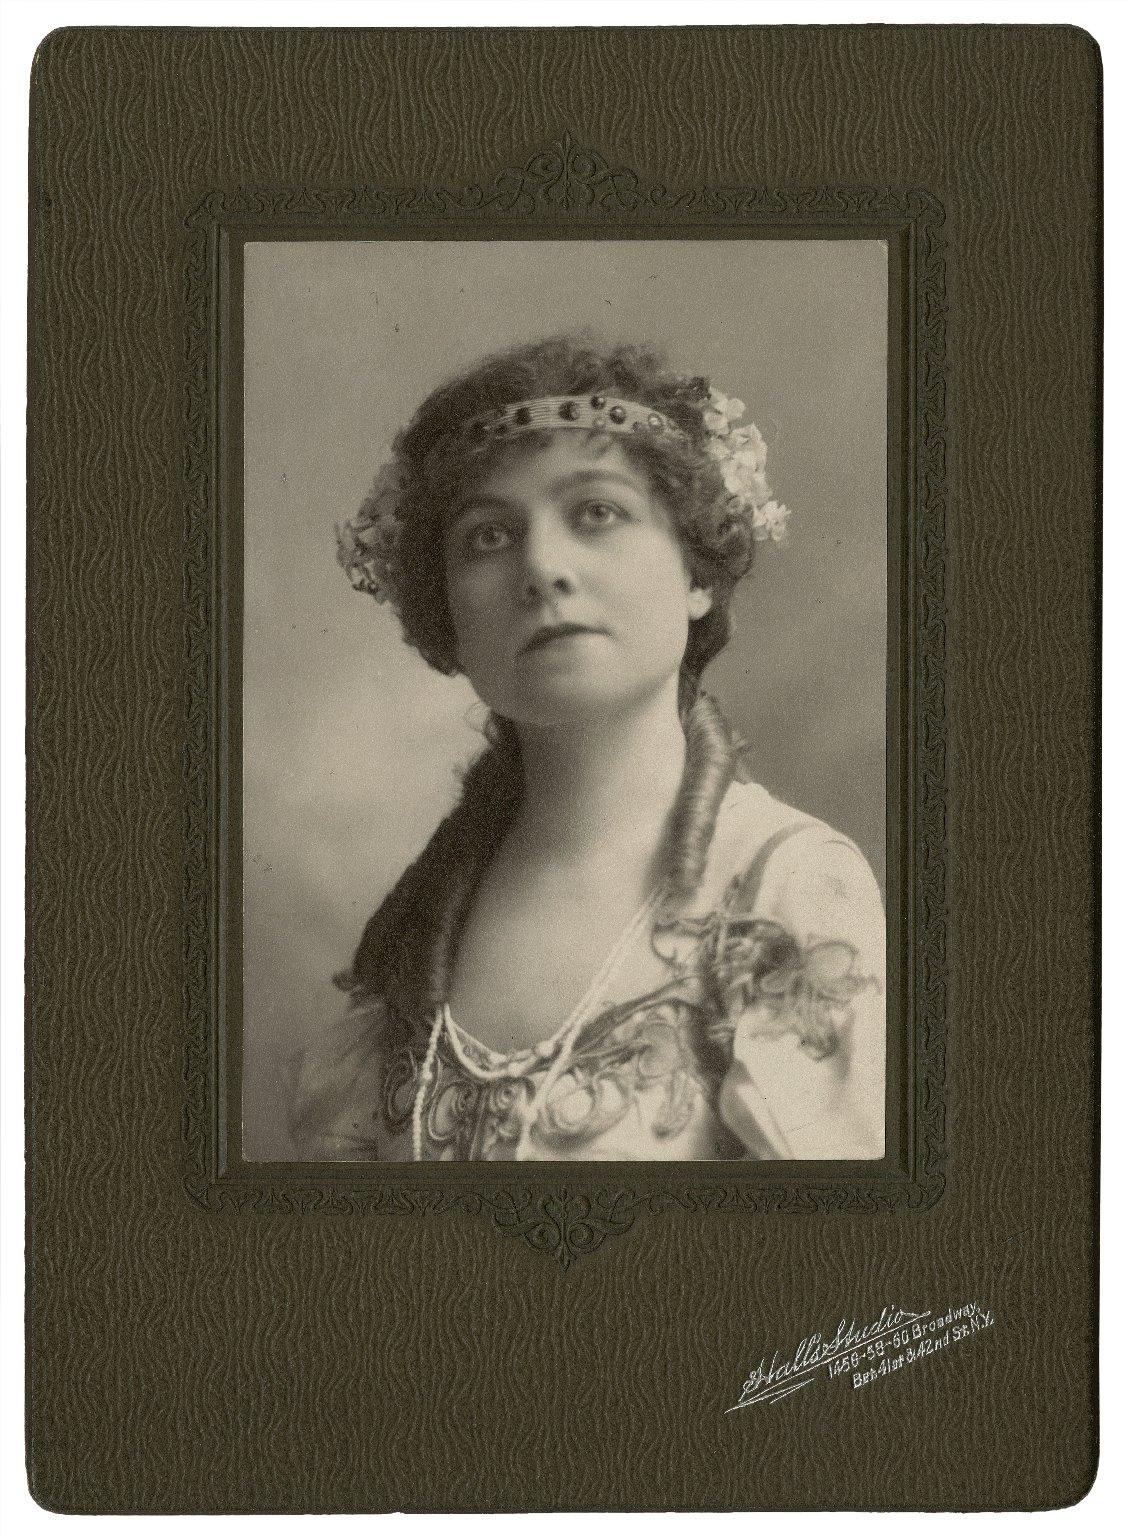 Eugenie Webb (Mrs. Frank Peters) [graphic] / Hall's Studio.